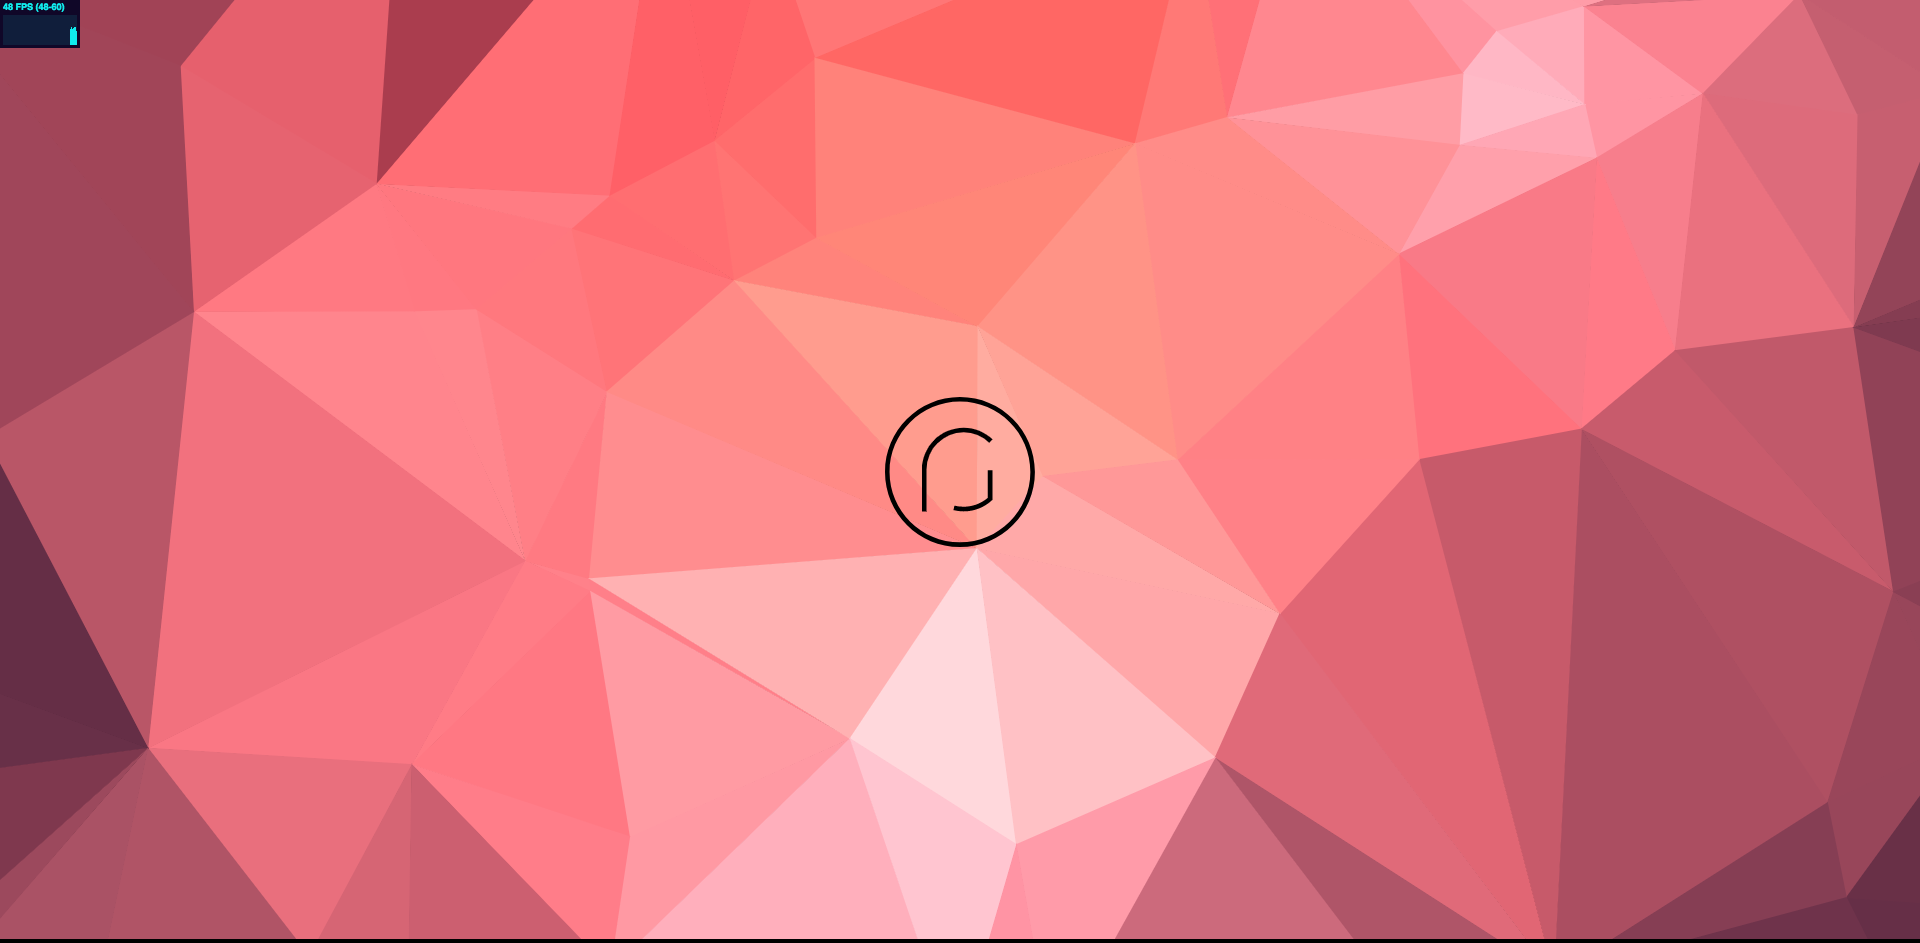 GitHub - patrickgates/ThreeJS-Low-Poly-Background-Generator